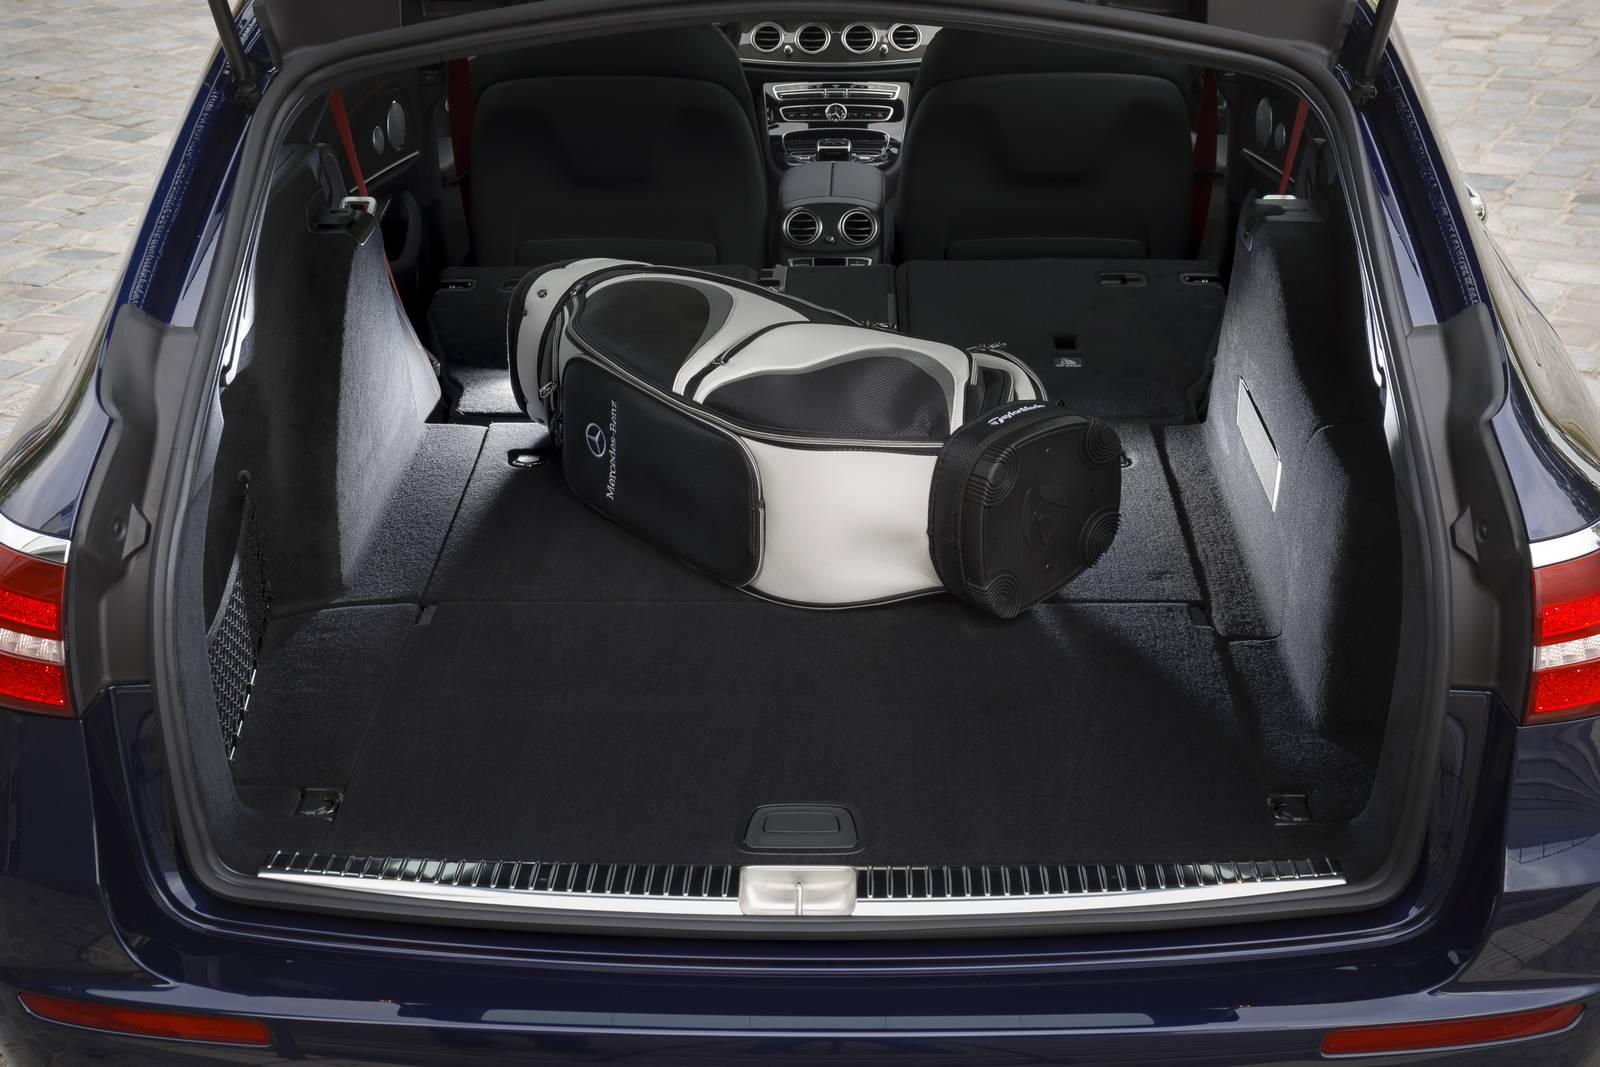 https://storage.googleapis.com/gtspirit/uploads/2016/09/Cavansite-Blue-Mercedes-AMG-E43-Estate-12.jpg